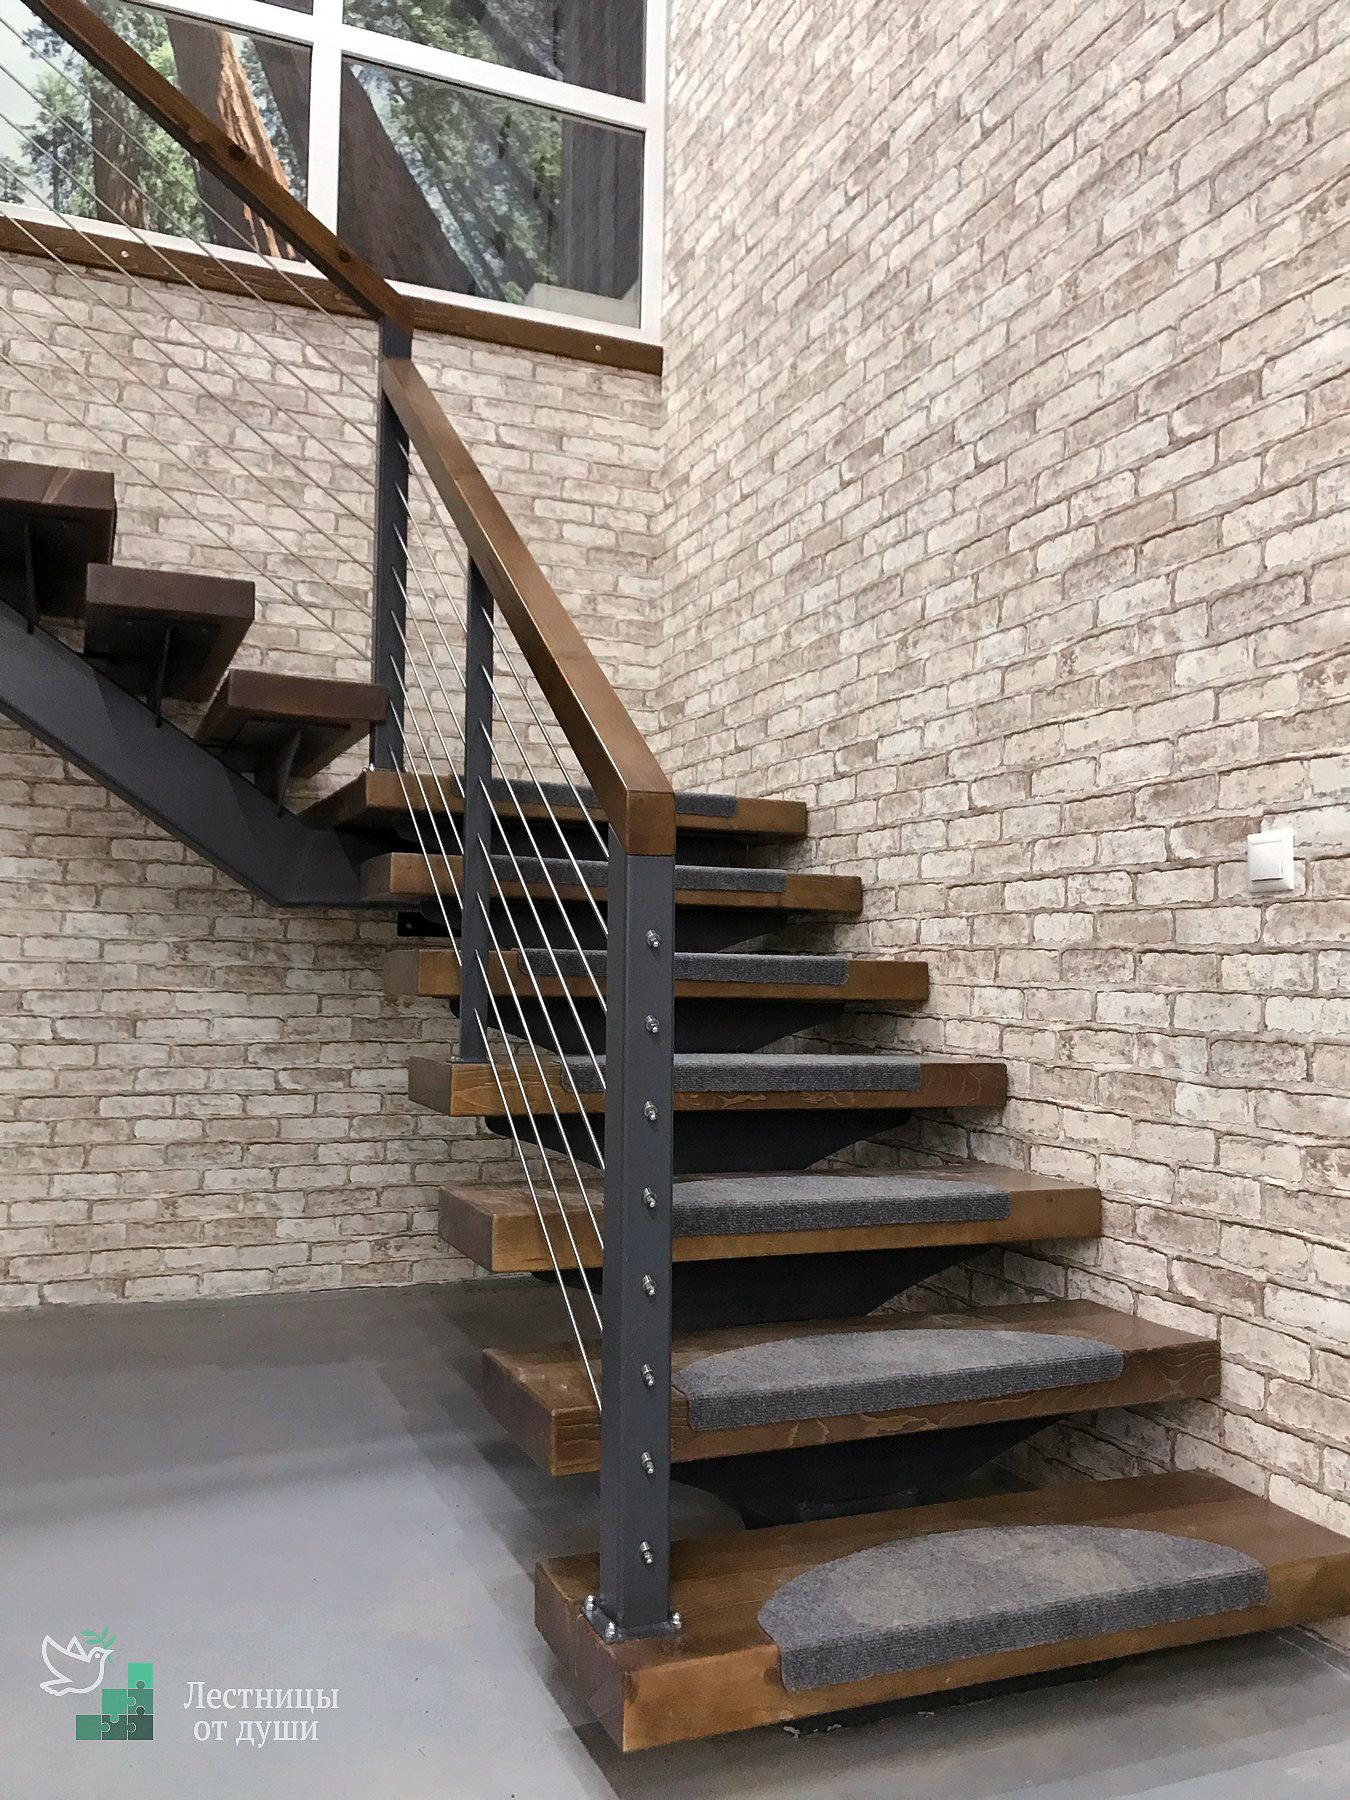 Лестница на металлическом монокосоуре в стиле лофт